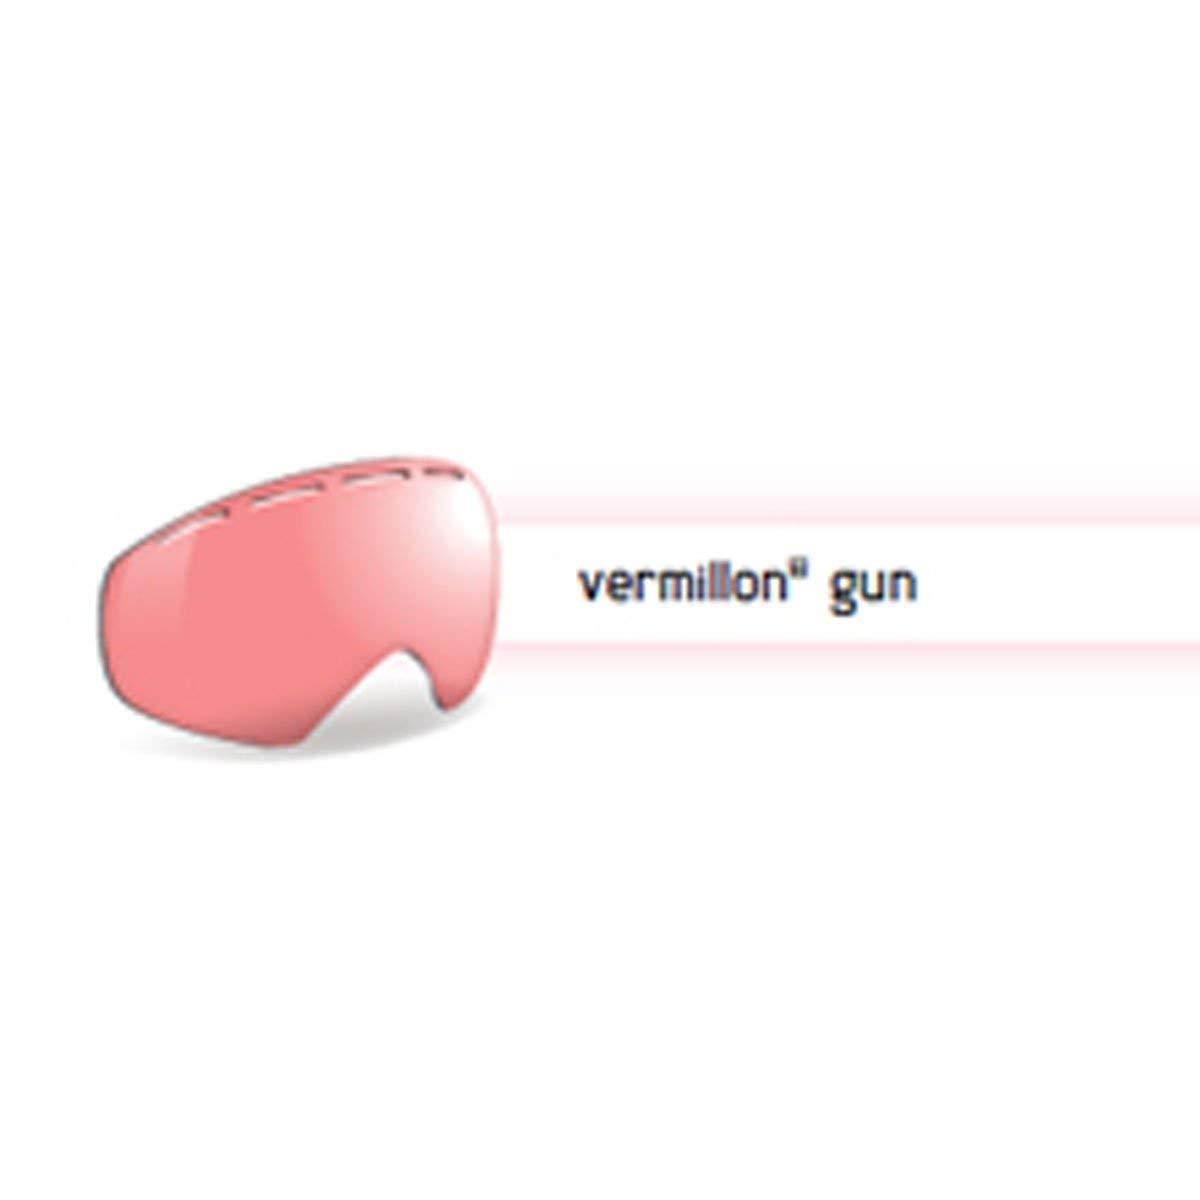 6c33f5ed4486 Get Quotations · Bolle 50571 Replacement Lenses Nova II Sunglasses,  Vermillon Gun